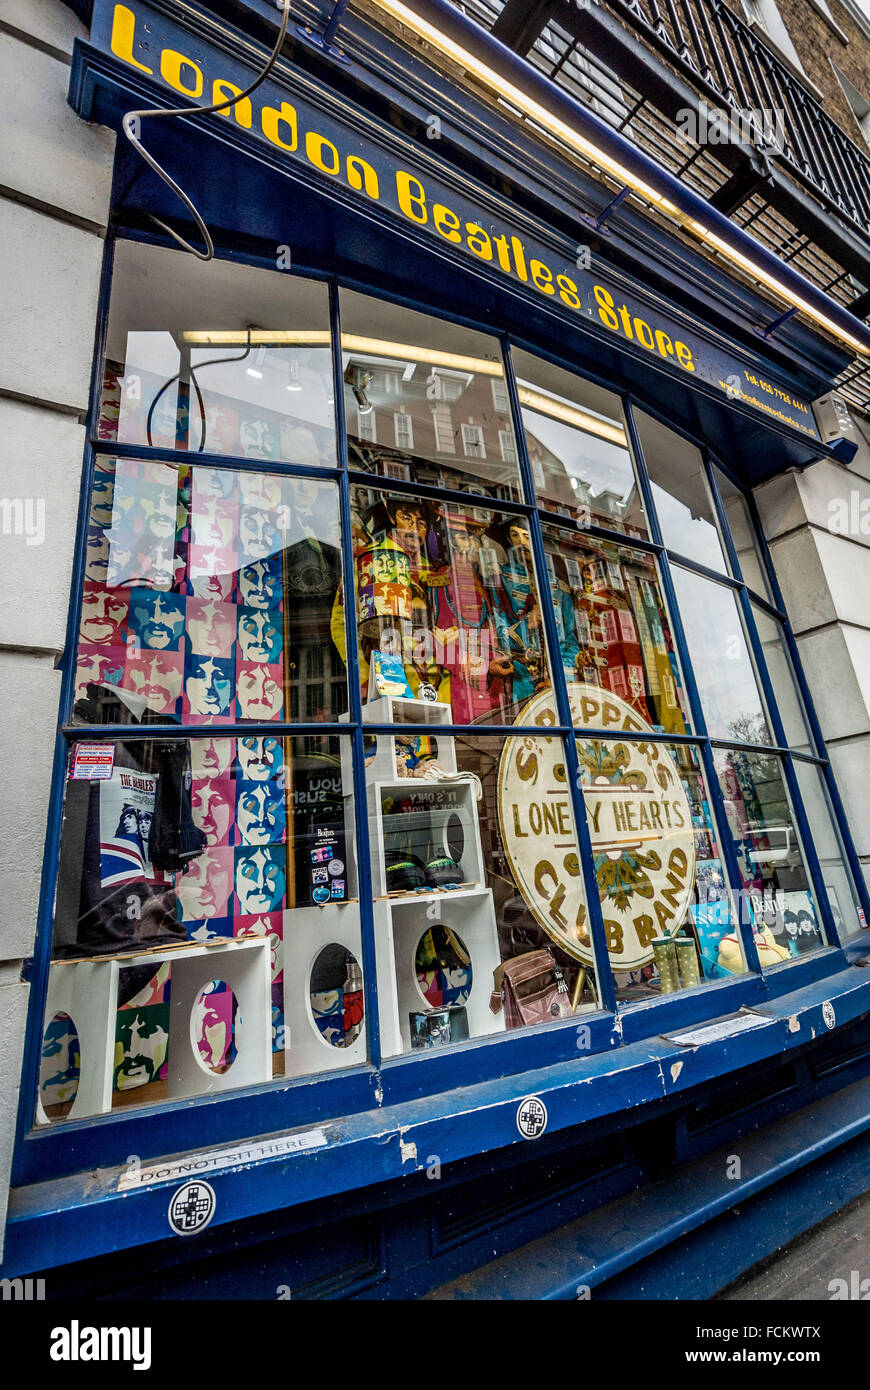 London Beatles Store, London, UK. - Stock Image